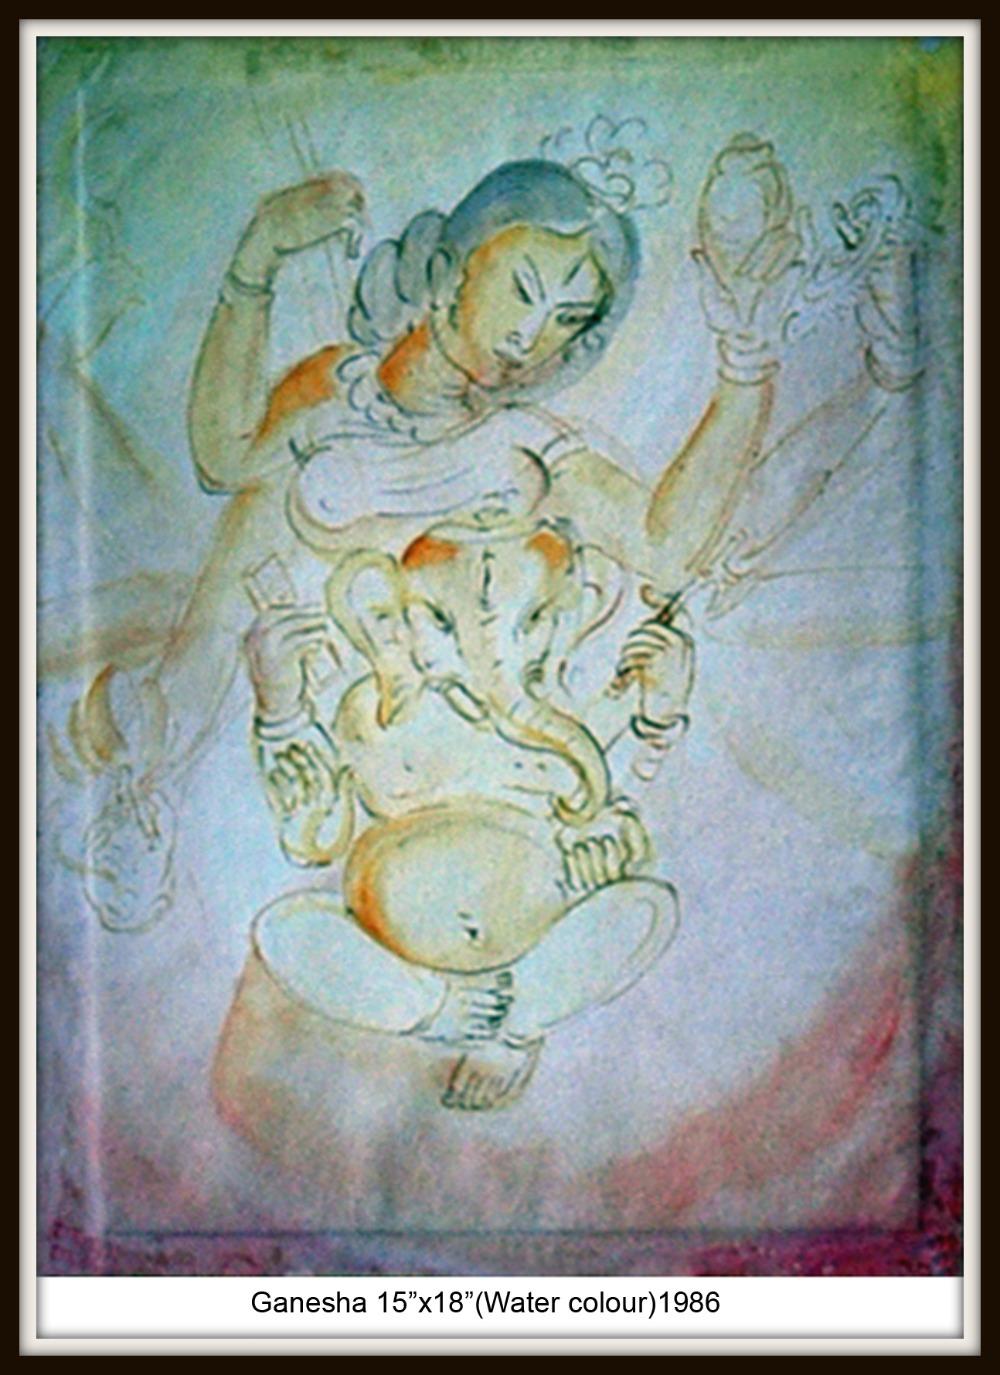 Monica Talukdar Ganesha (Water Colour)